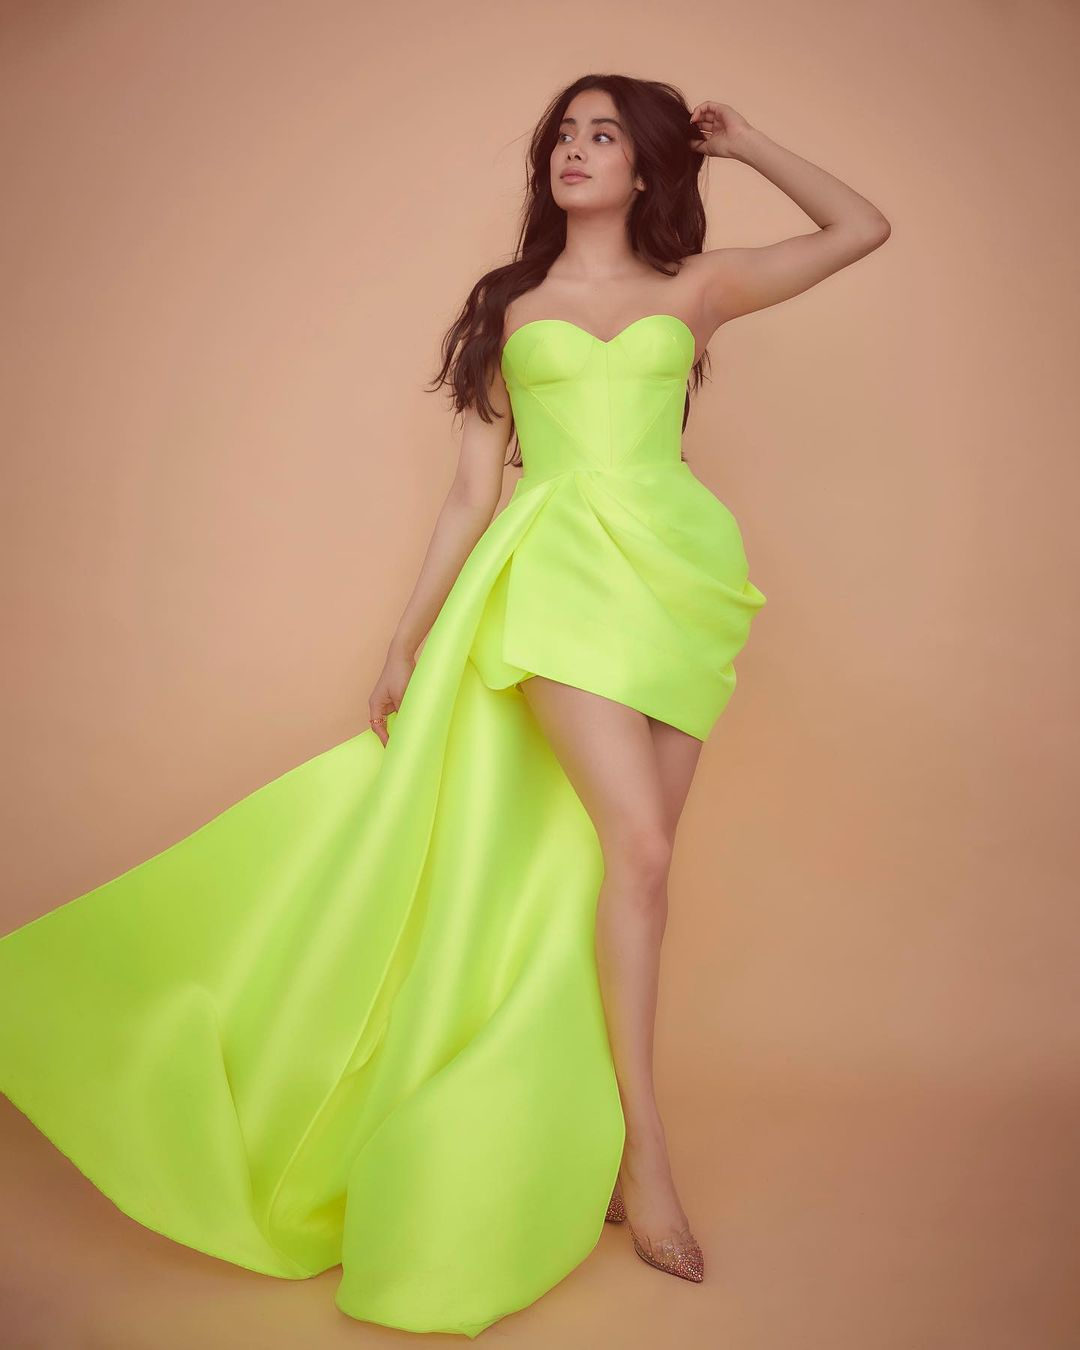 Janhvi Kapoor sexy